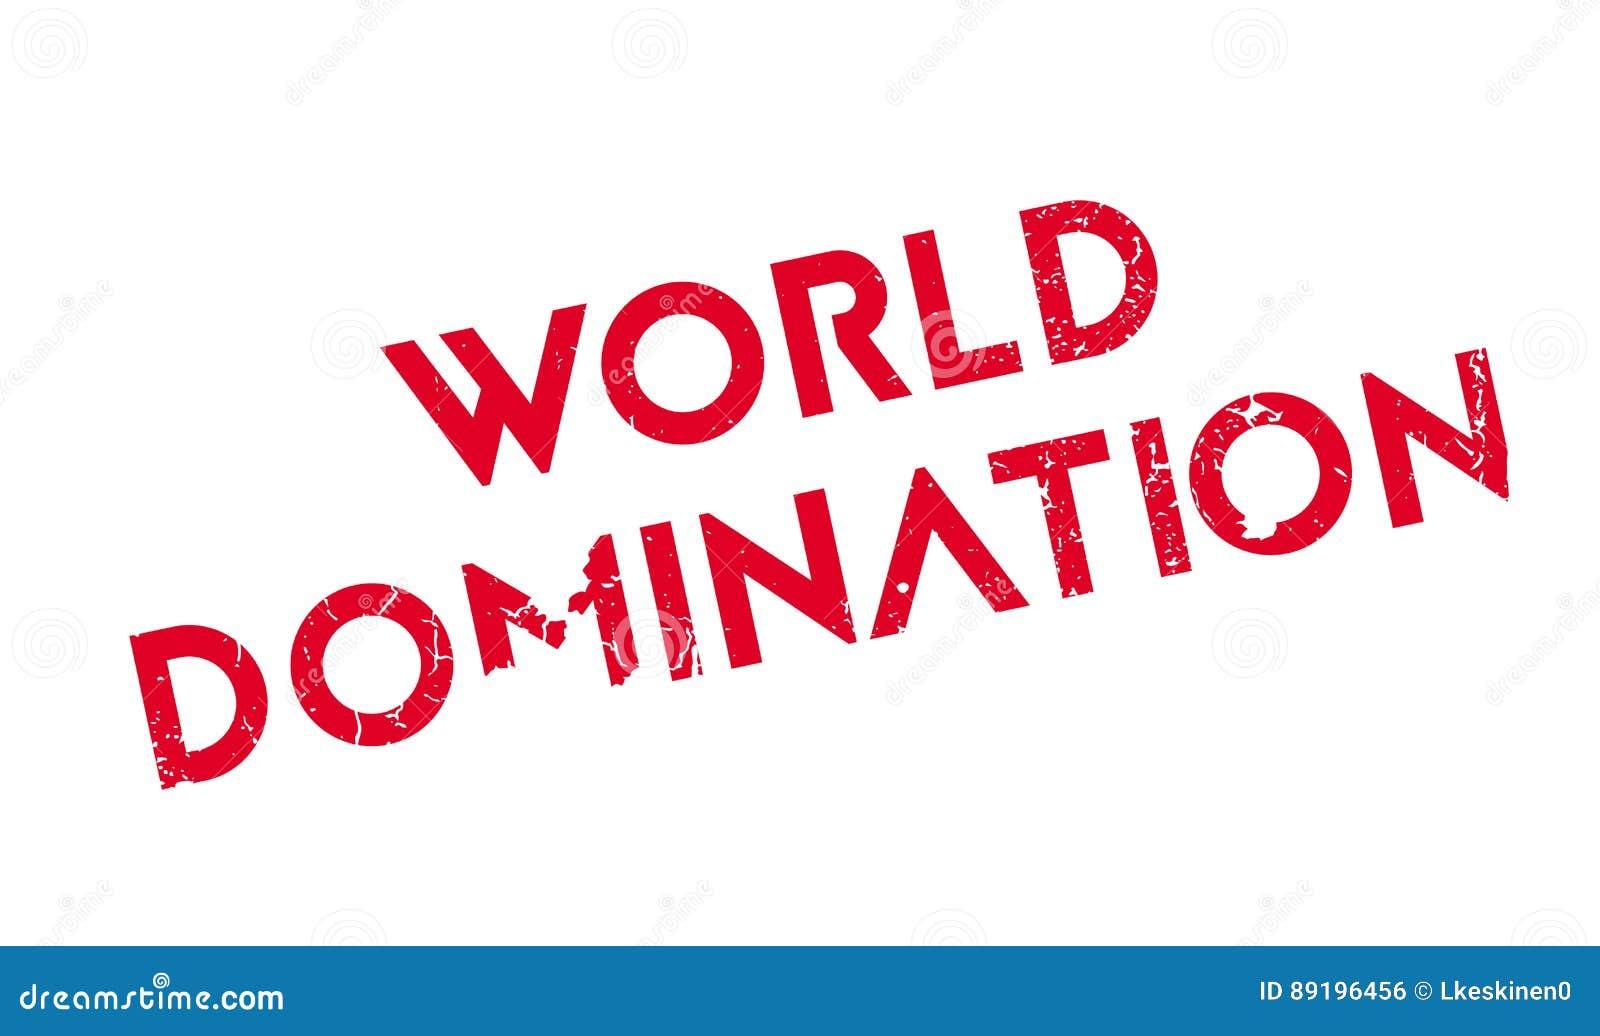 world domination video